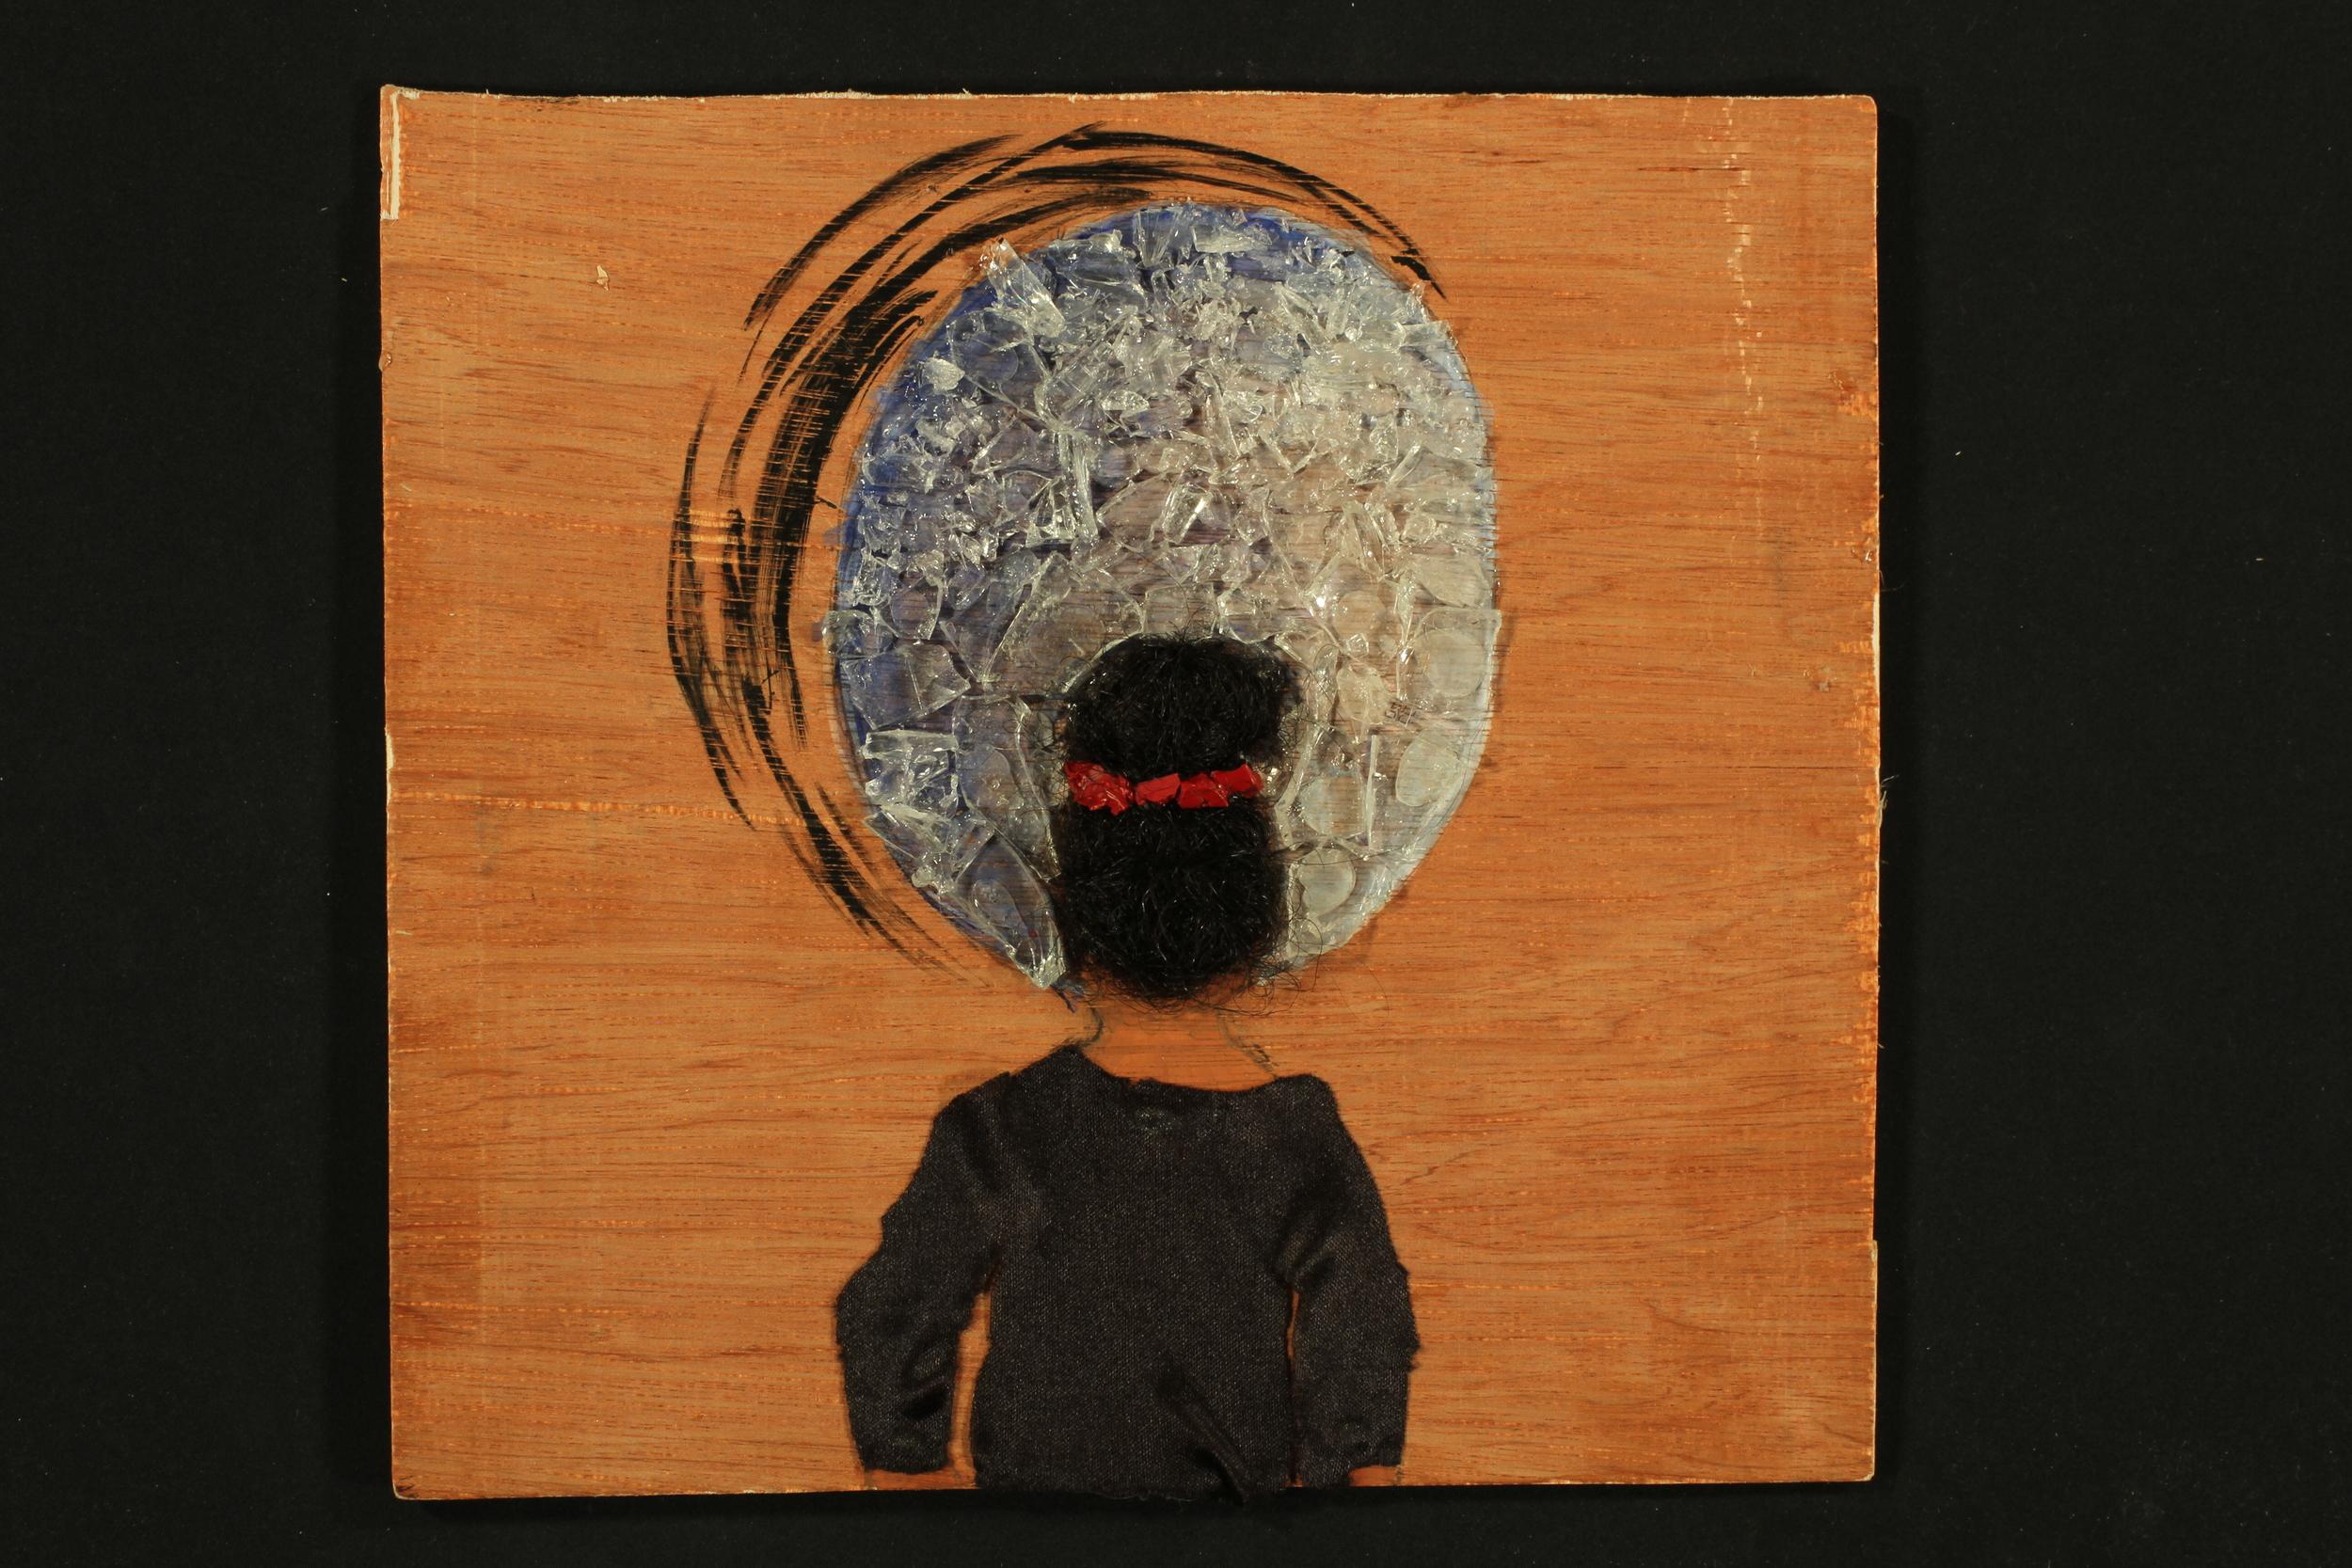 American Dreamin'  2014, wood, silk, acrylic, hair, broken glass, ink, 10in x 11in